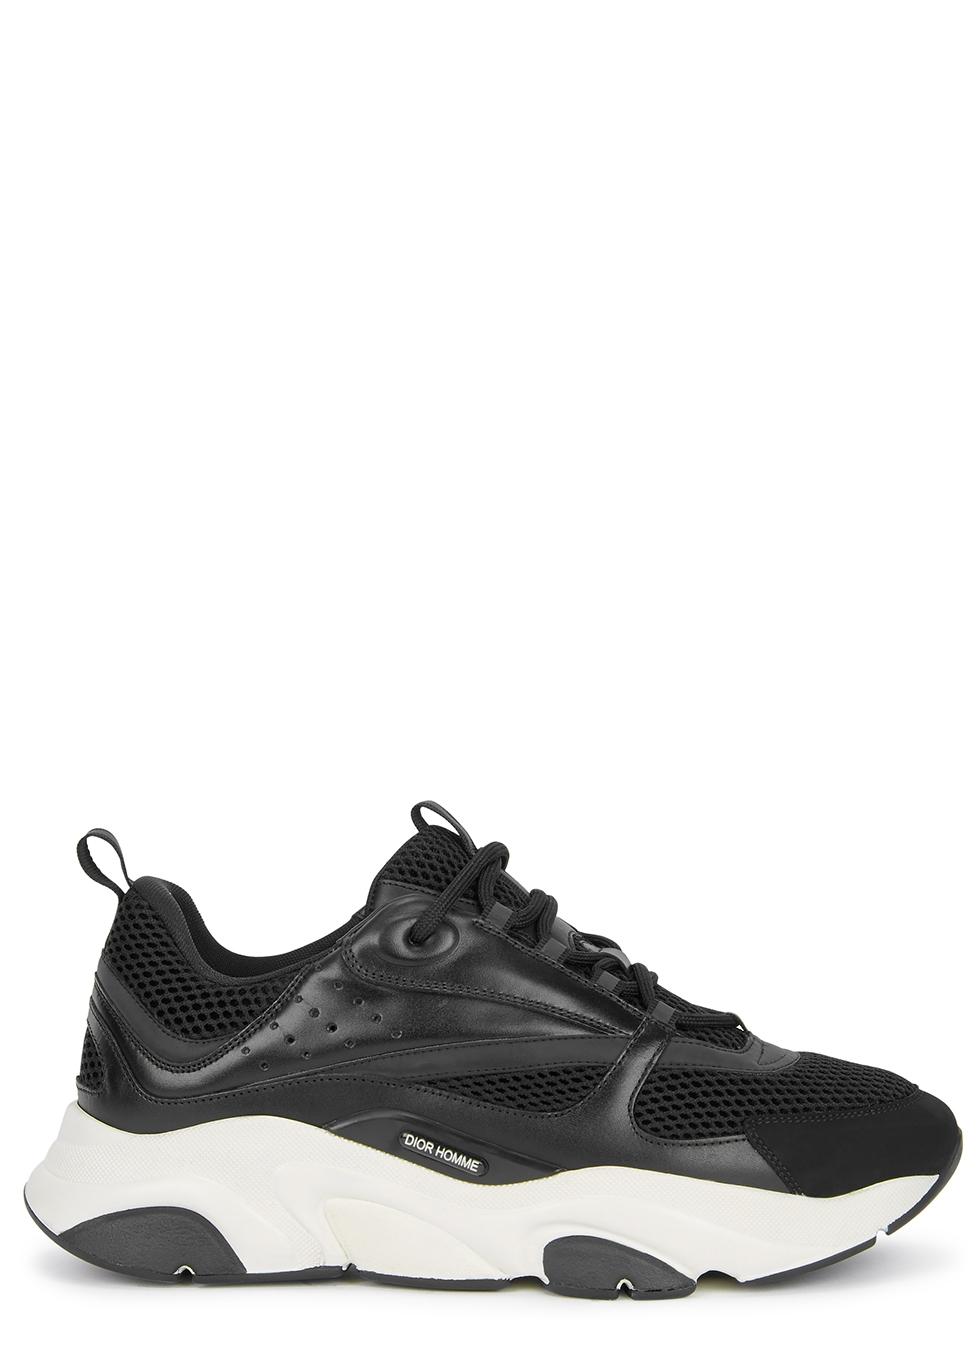 8eb958752f8 Men's Designer Trainers, Sneakers & Sports Shoes - Harvey Nichols